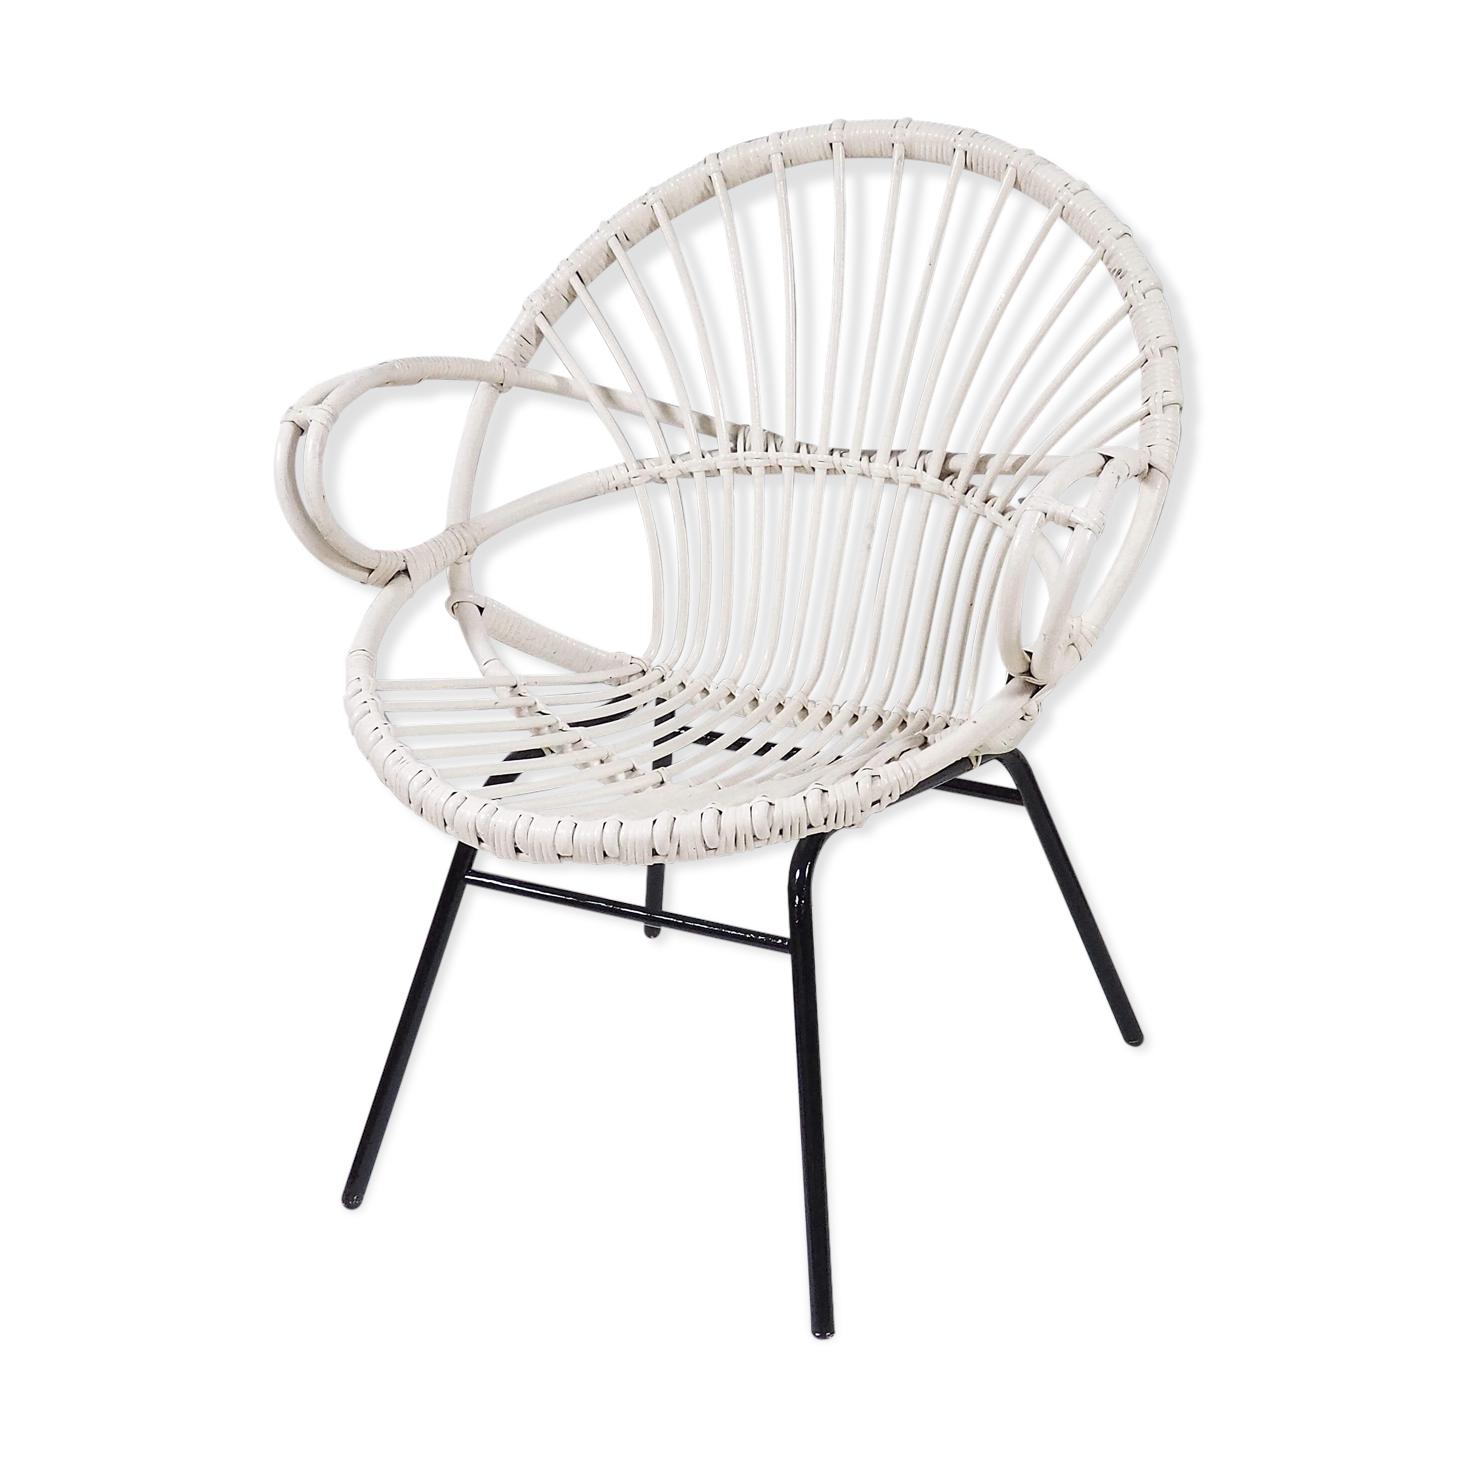 fauteuil rotin blanc - rotin et osier - blanc - vintage - qiagimd